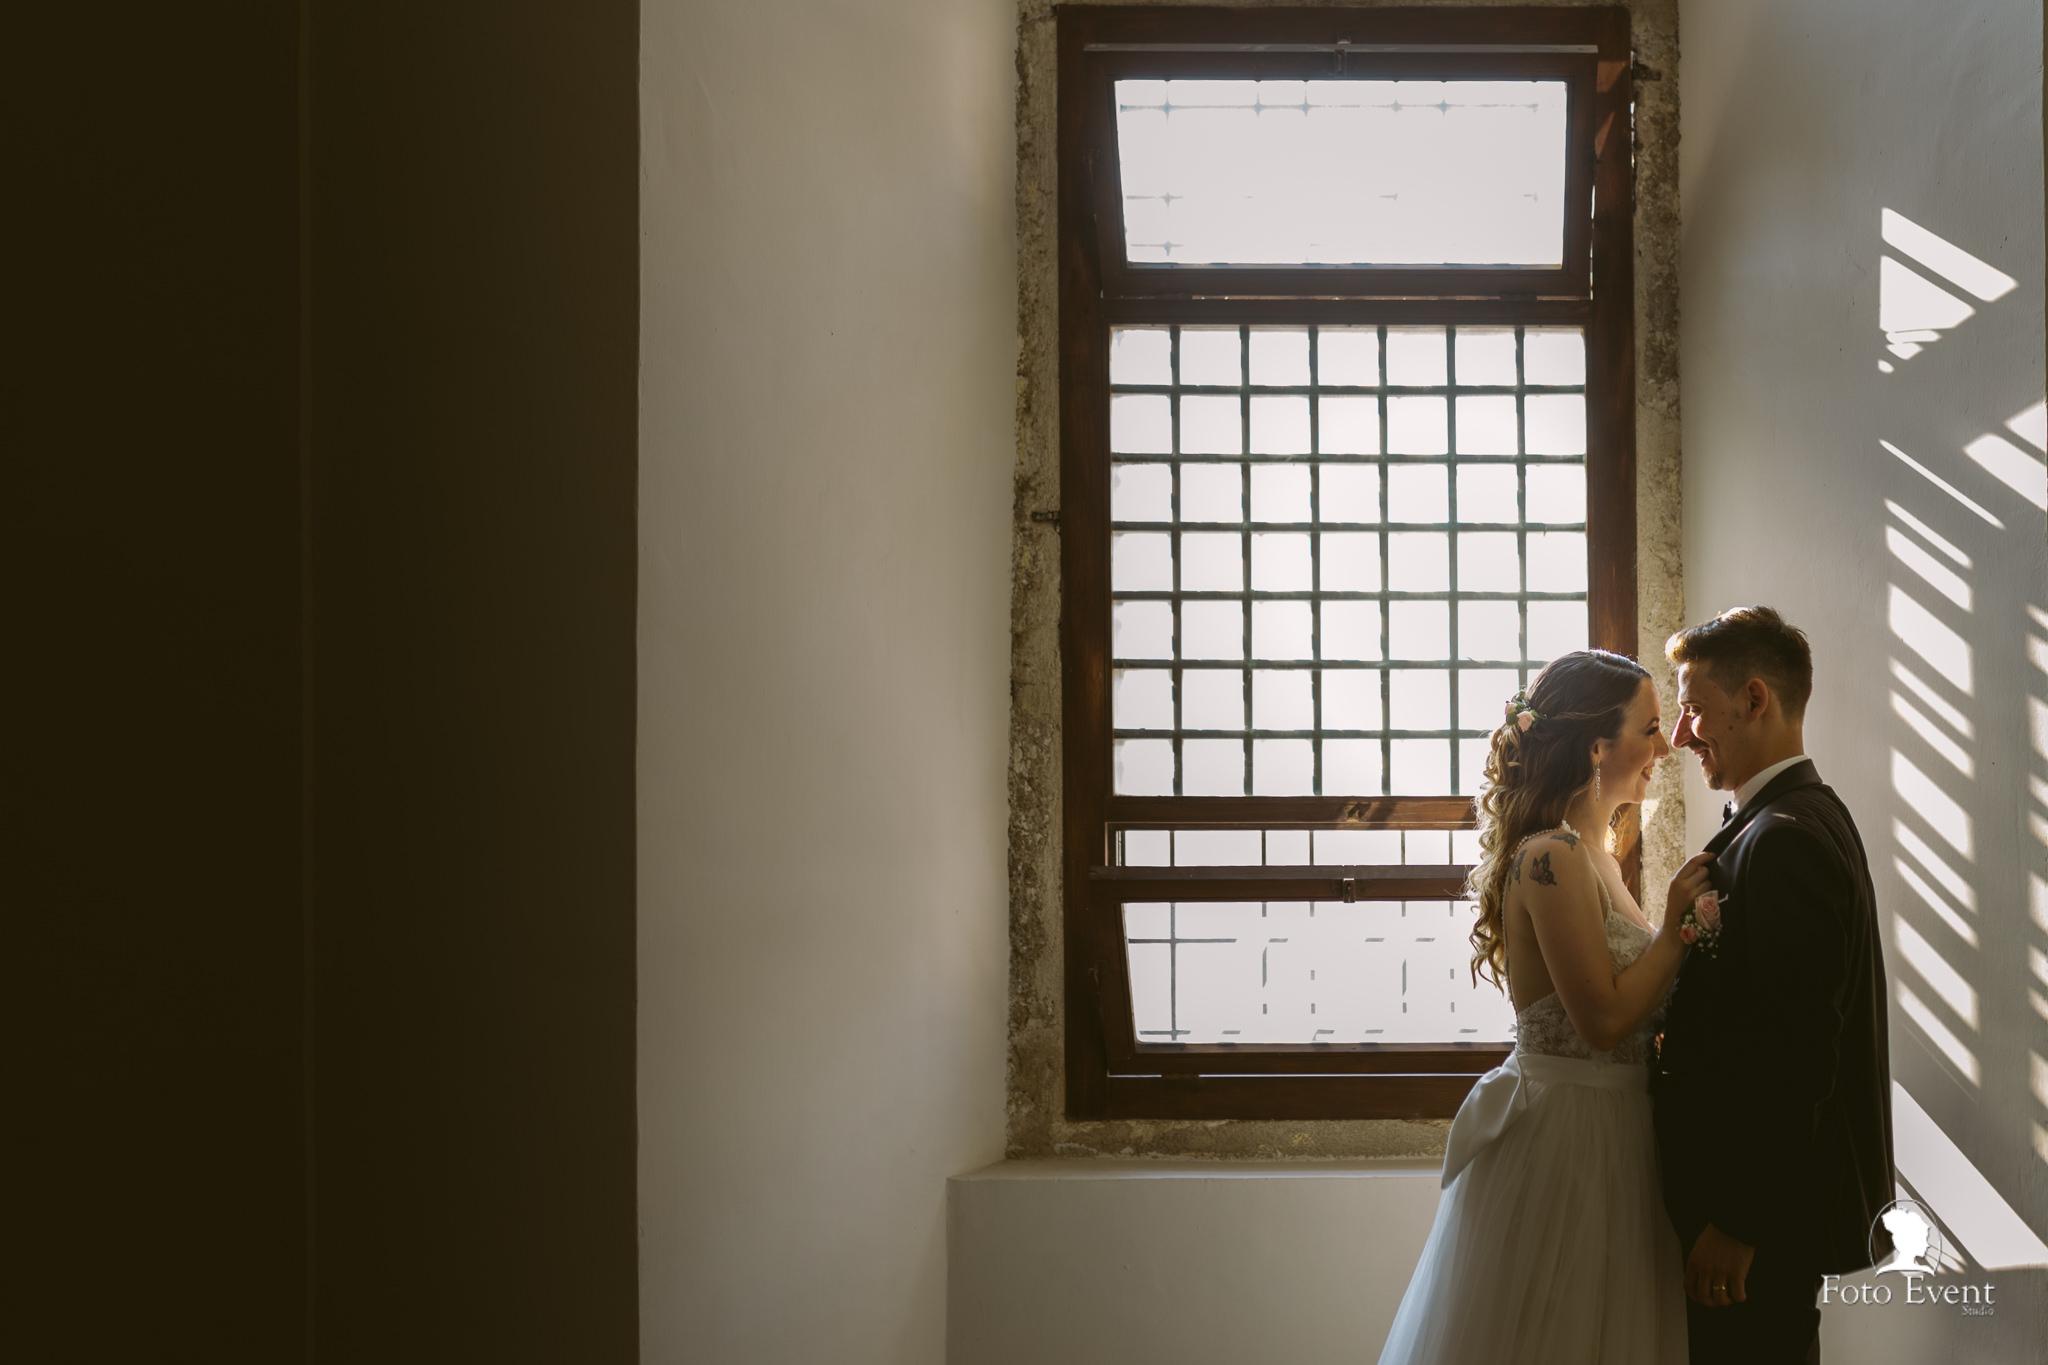 041-2019-08-22-Matrimonio-Angela-e-Nicola-Iaconis-Ric2-501